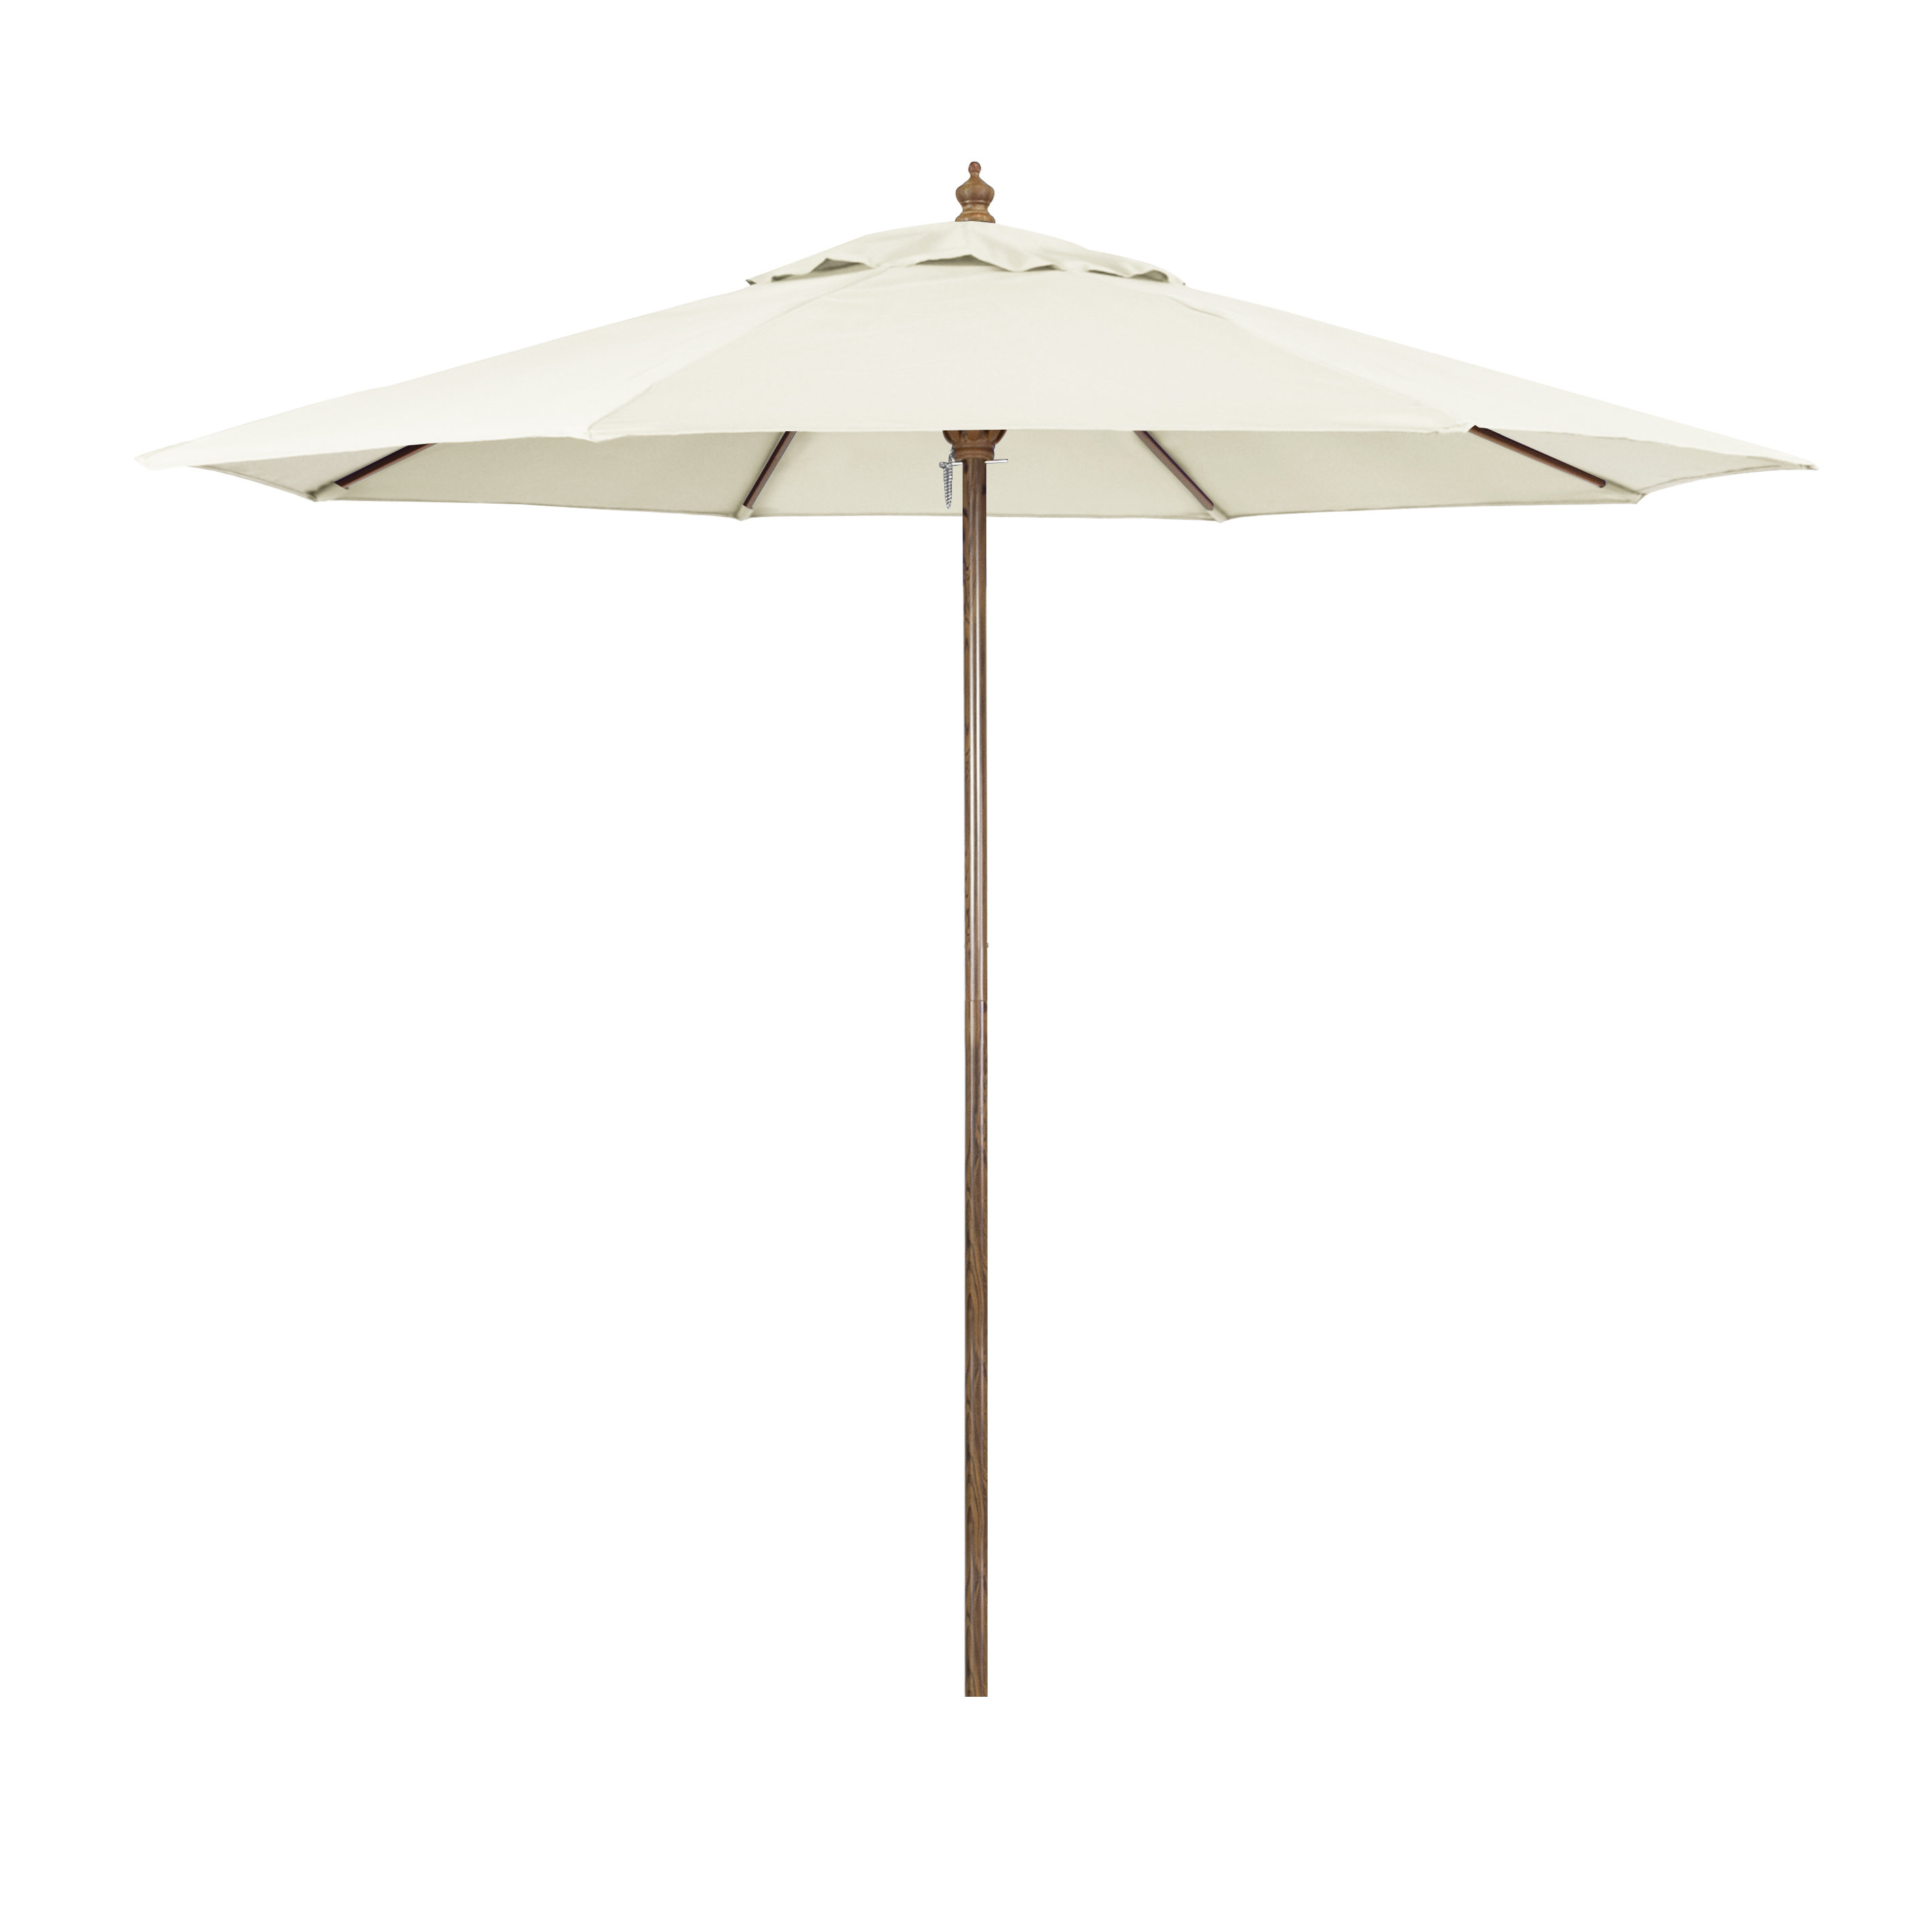 Widely Used Carina Market Umbrellas Inside Ryant 9' Market Umbrella (View 20 of 20)